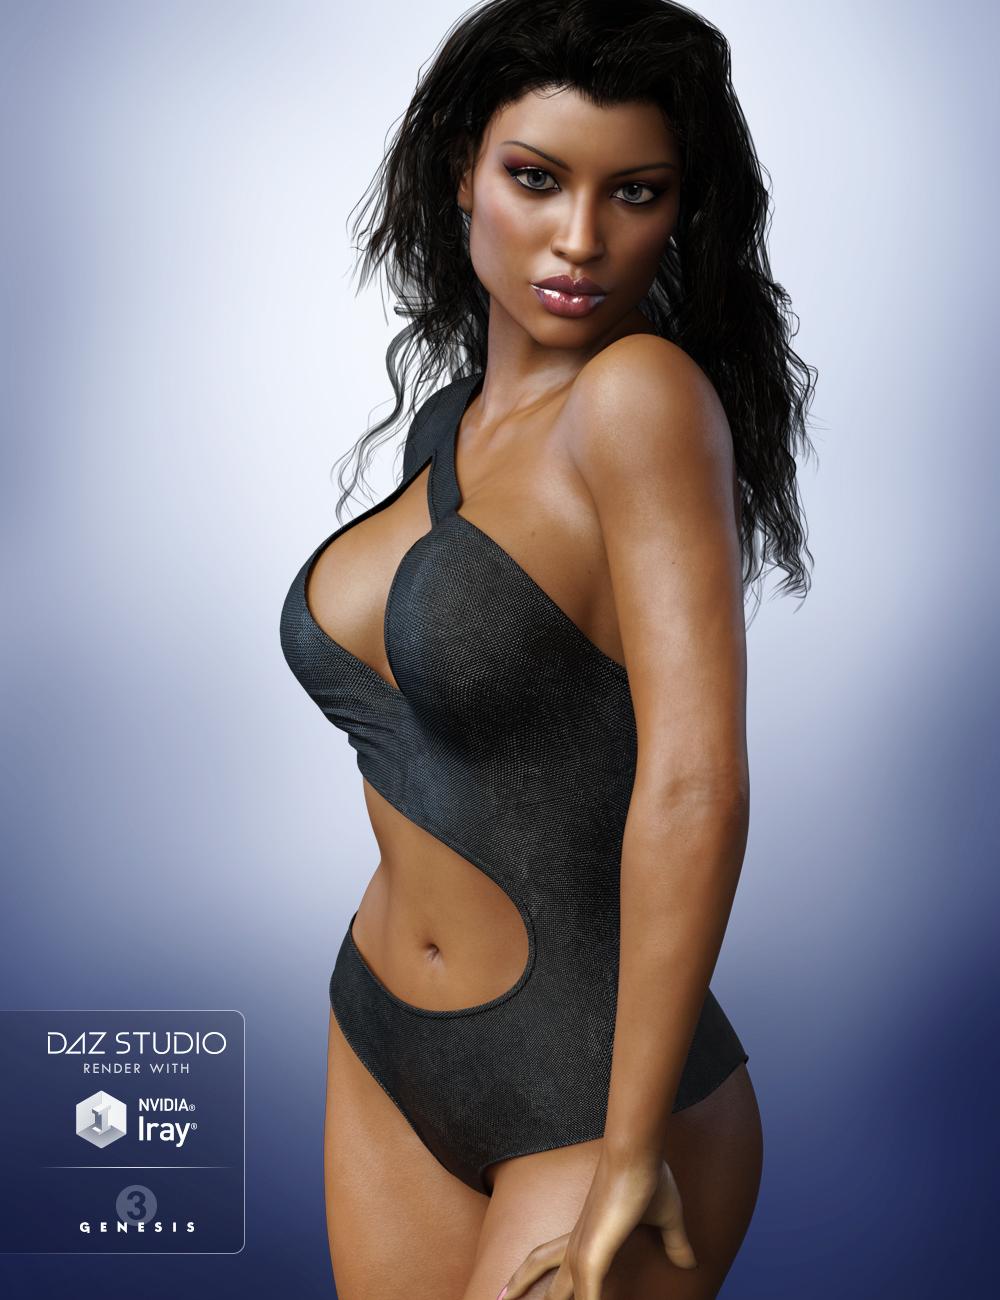 FWSA Tisha HD for Monique 7 by: Fred Winkler ArtSabby, 3D Models by Daz 3D